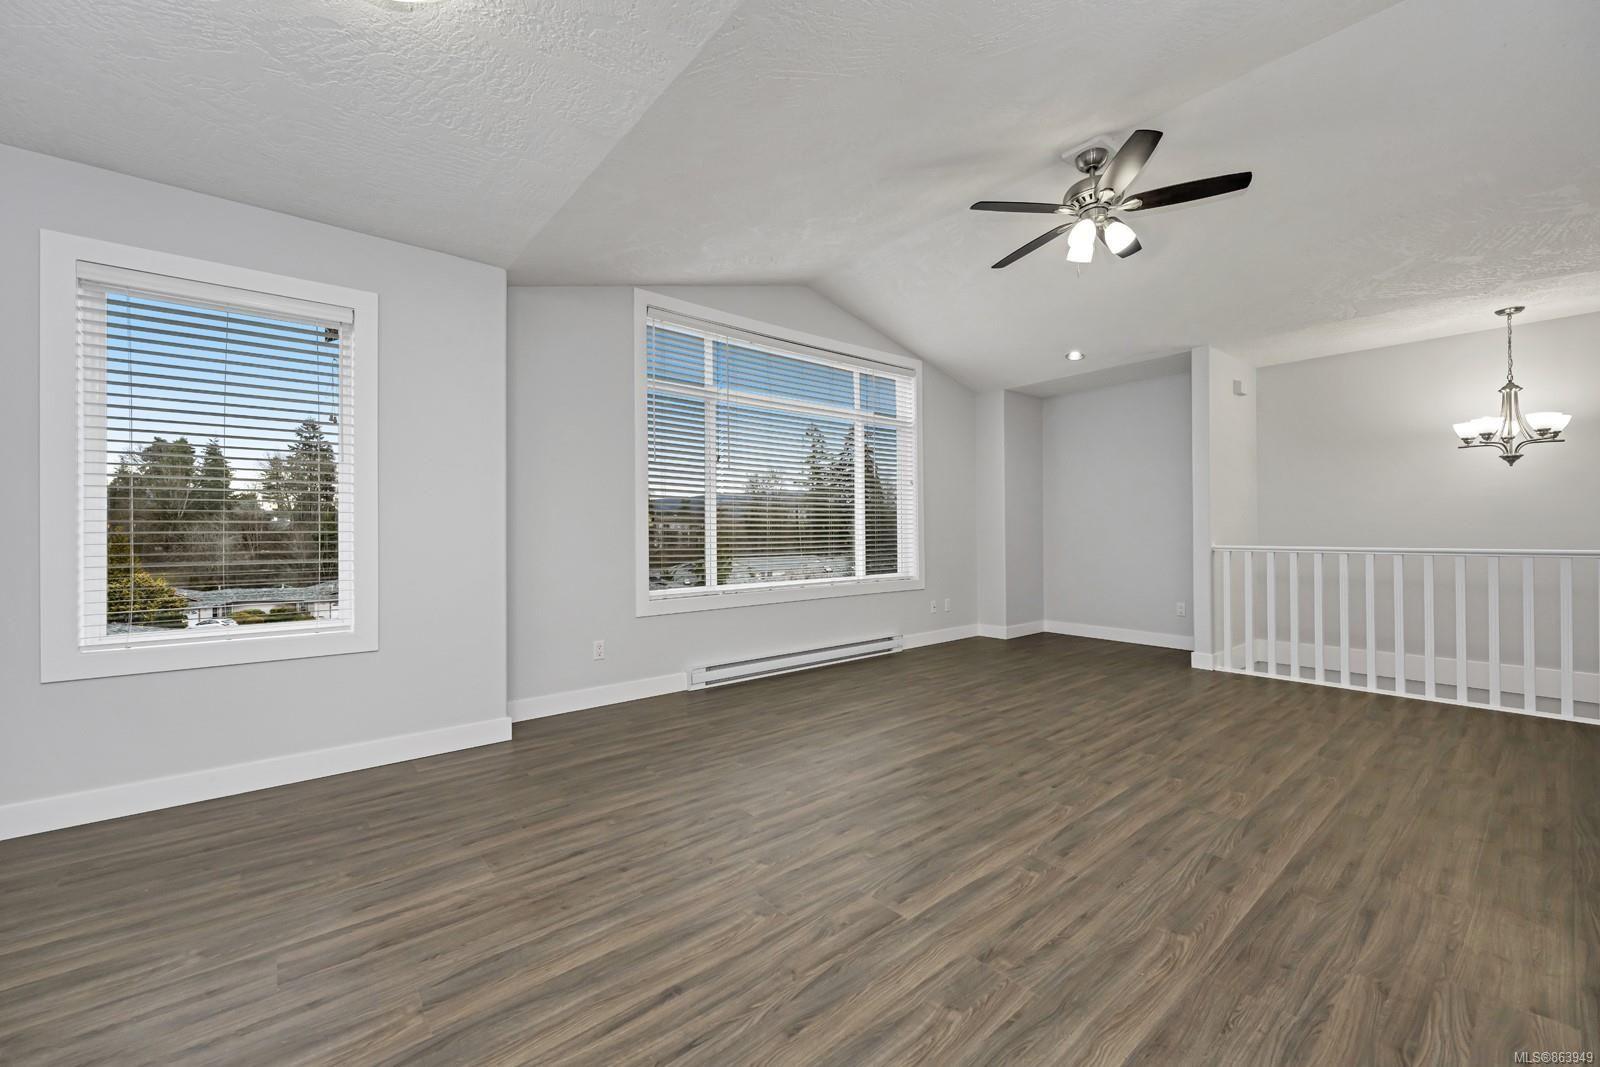 Photo 11: Photos: 6154 Sayward Rd in : Du West Duncan Half Duplex for sale (Duncan)  : MLS®# 863949